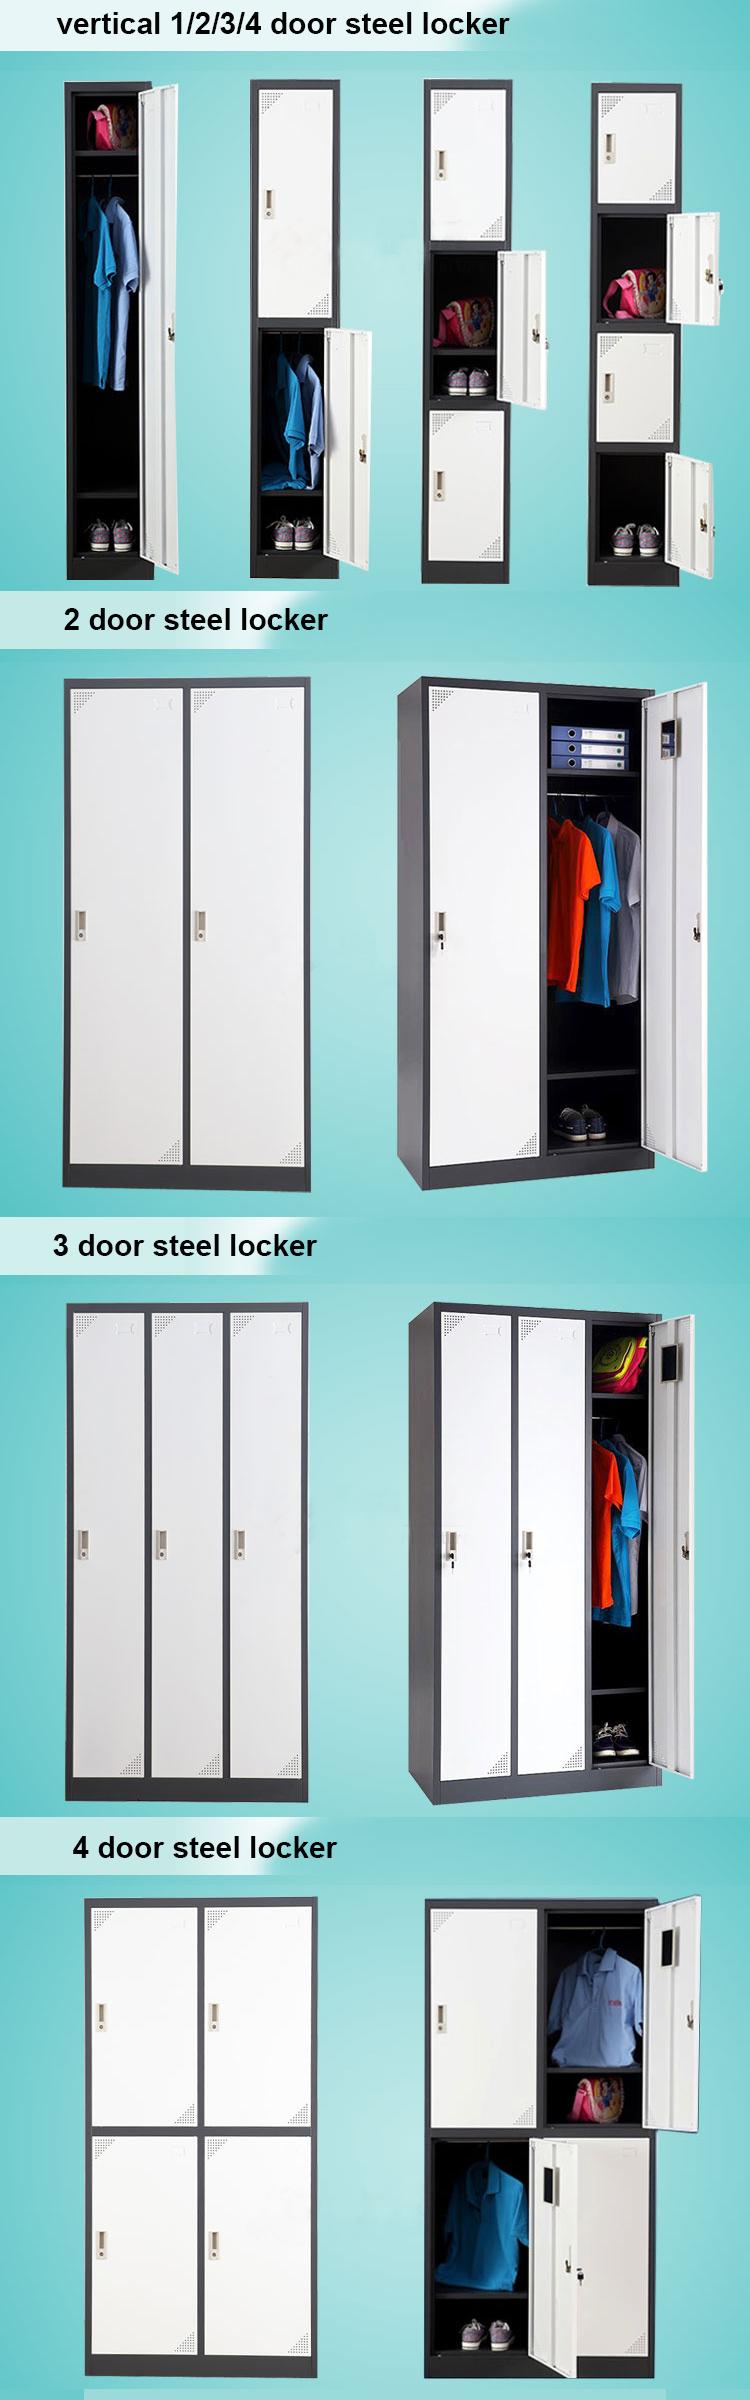 Metalen opbergkast in staal met dubbele deur inserts en lade ...